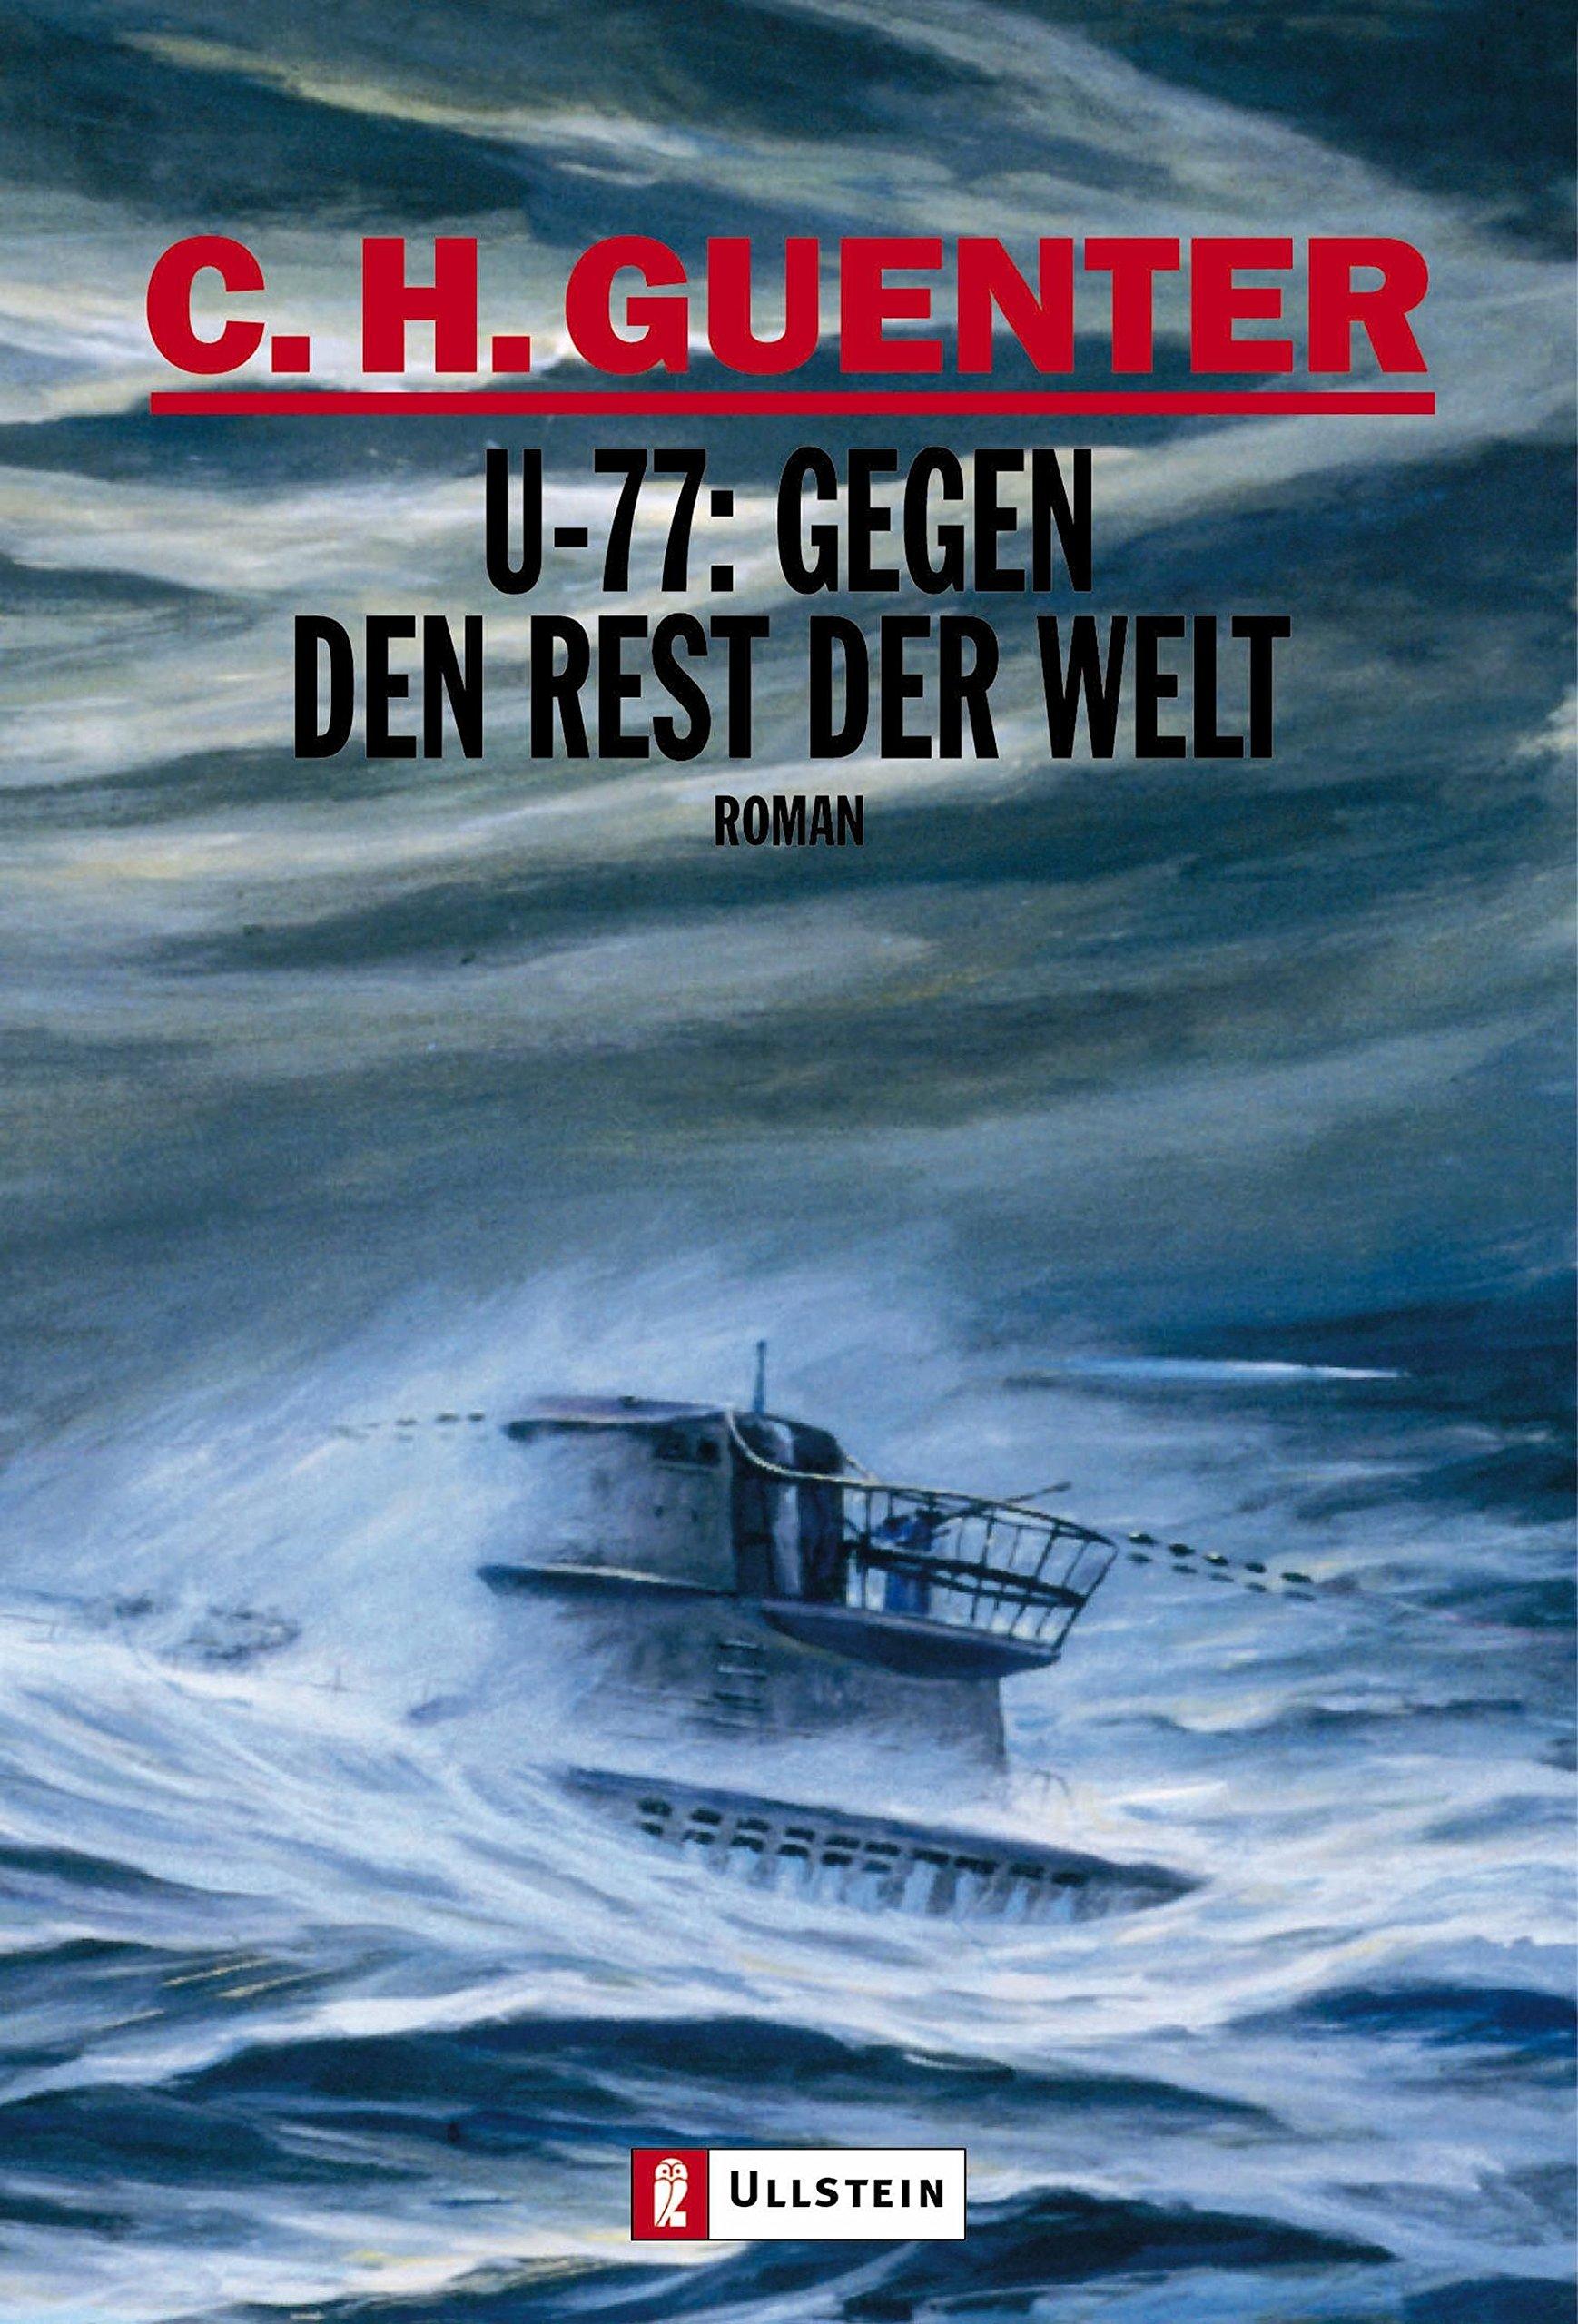 U-77: Gegen den Rest der Welt